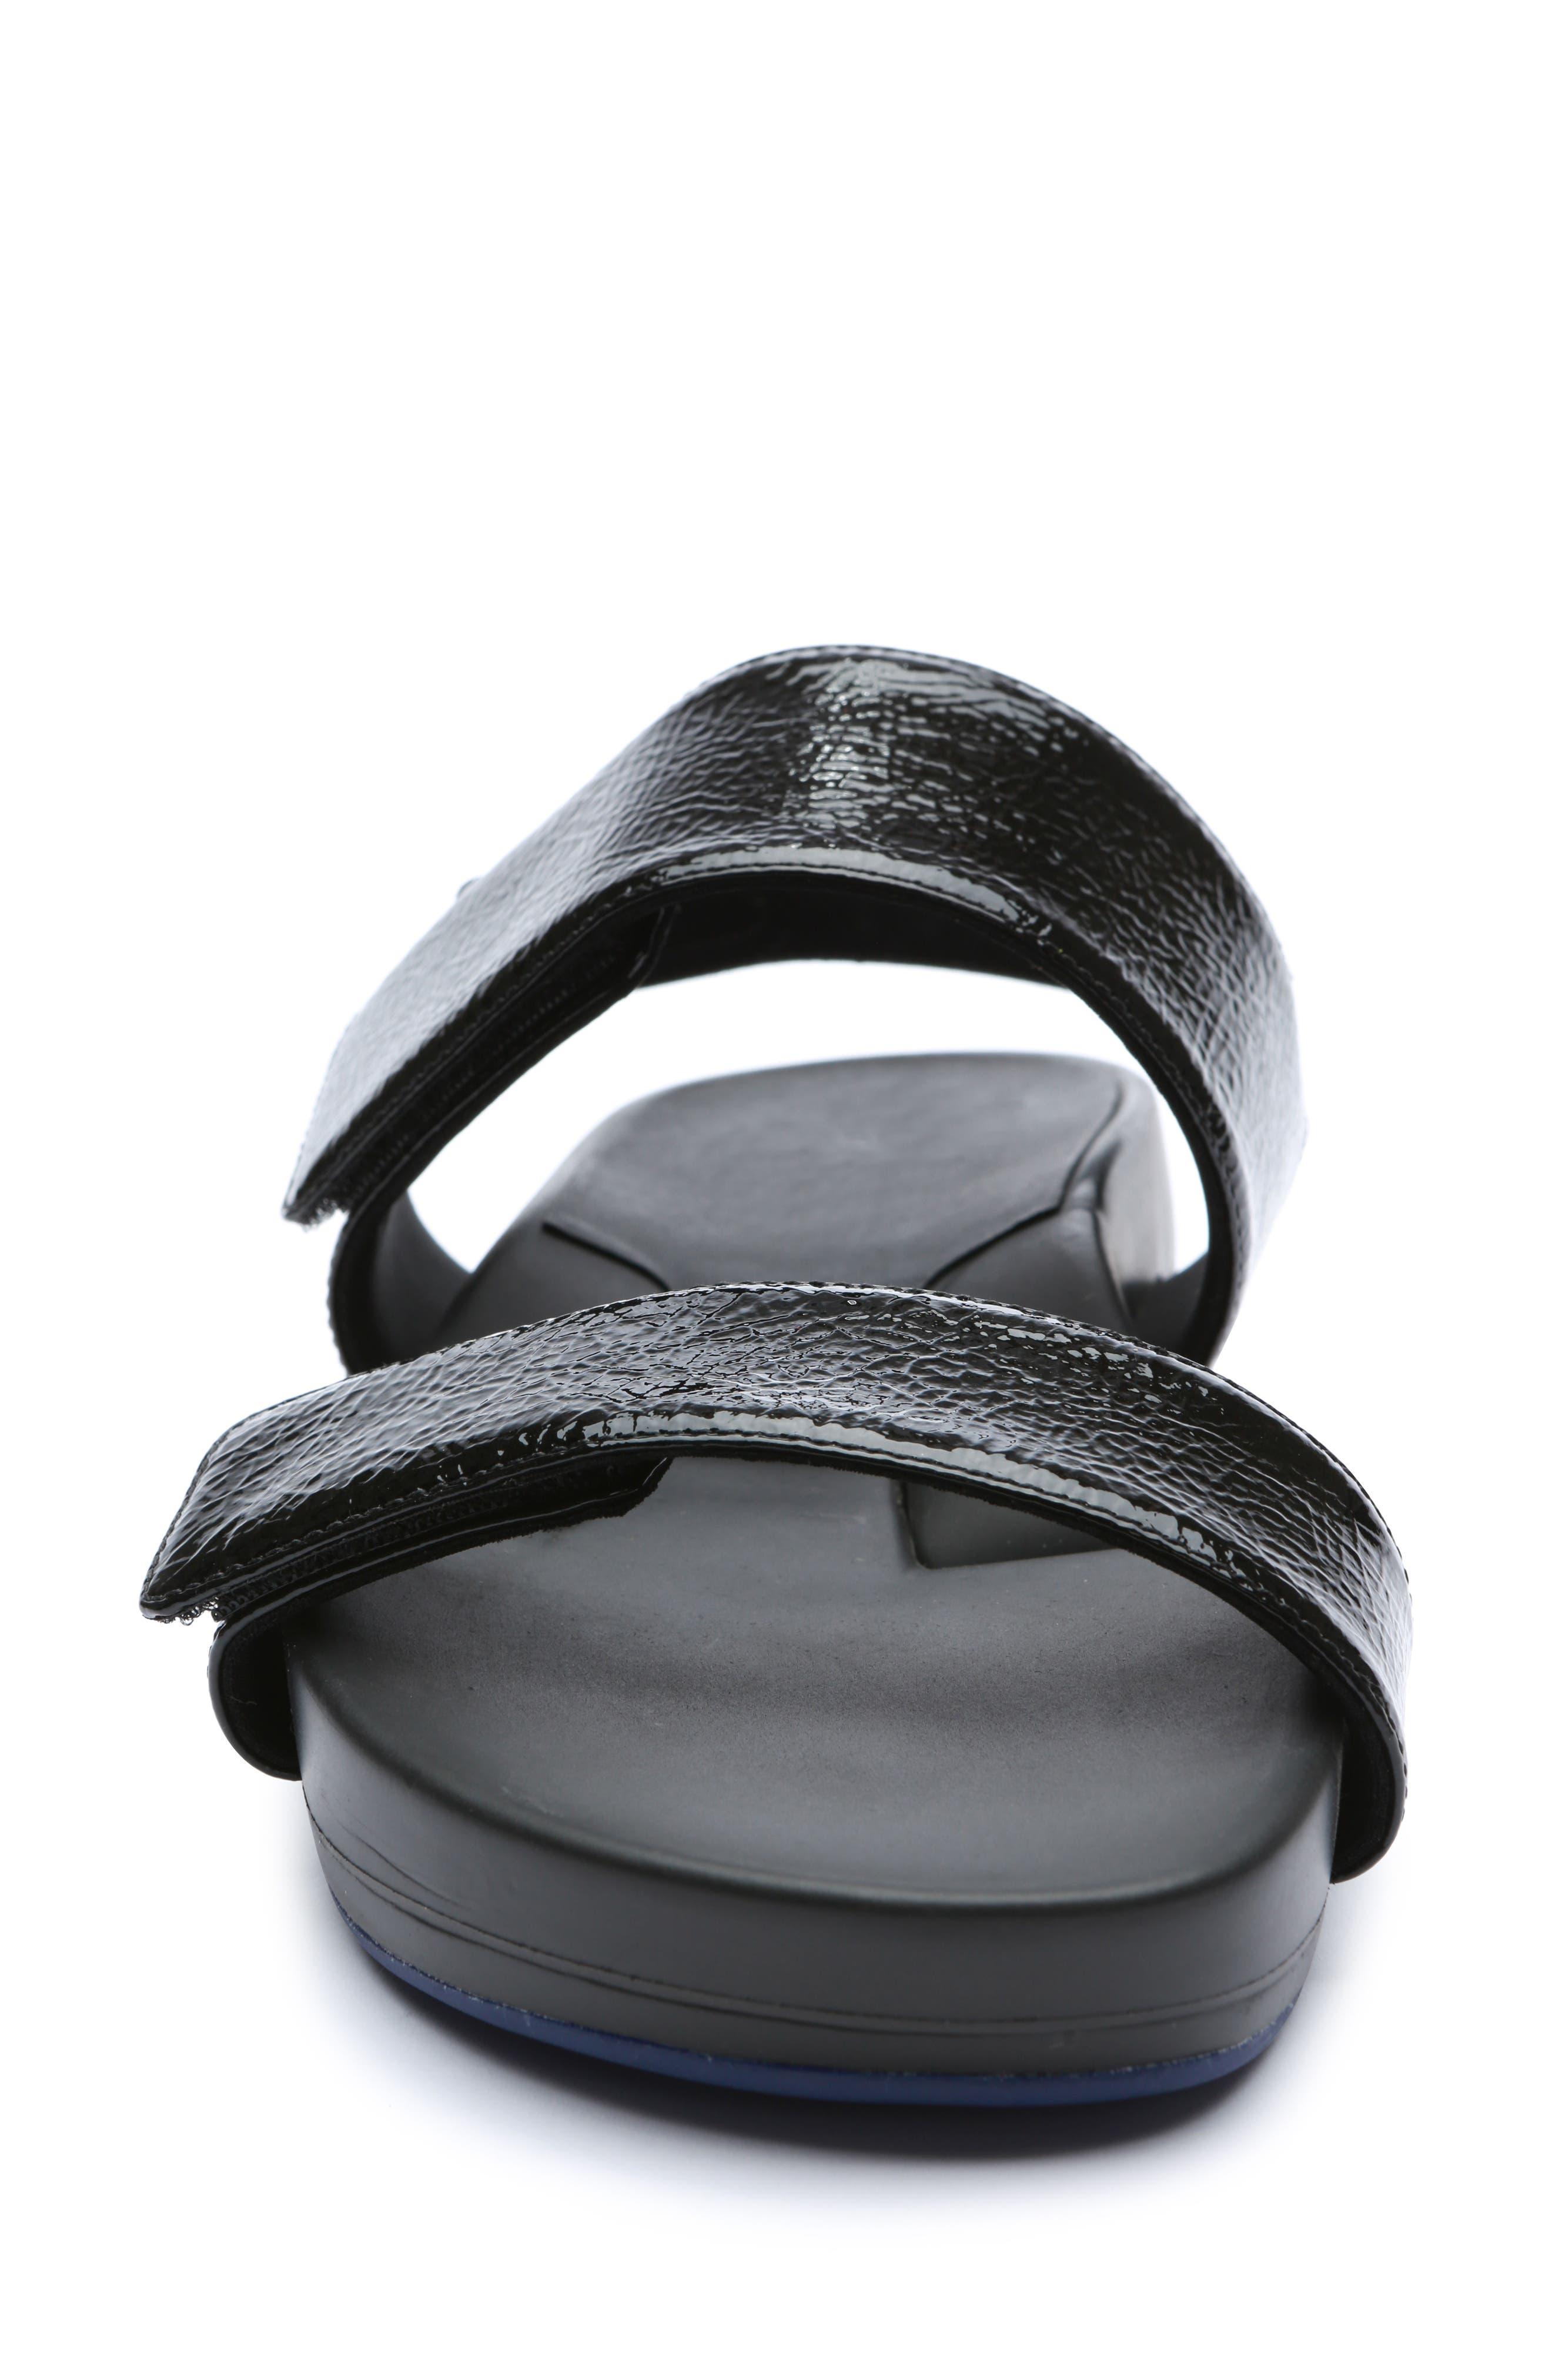 Figulous Sandal,                             Alternate thumbnail 4, color,                             BLACK CRINKLE PATENT LEATHER